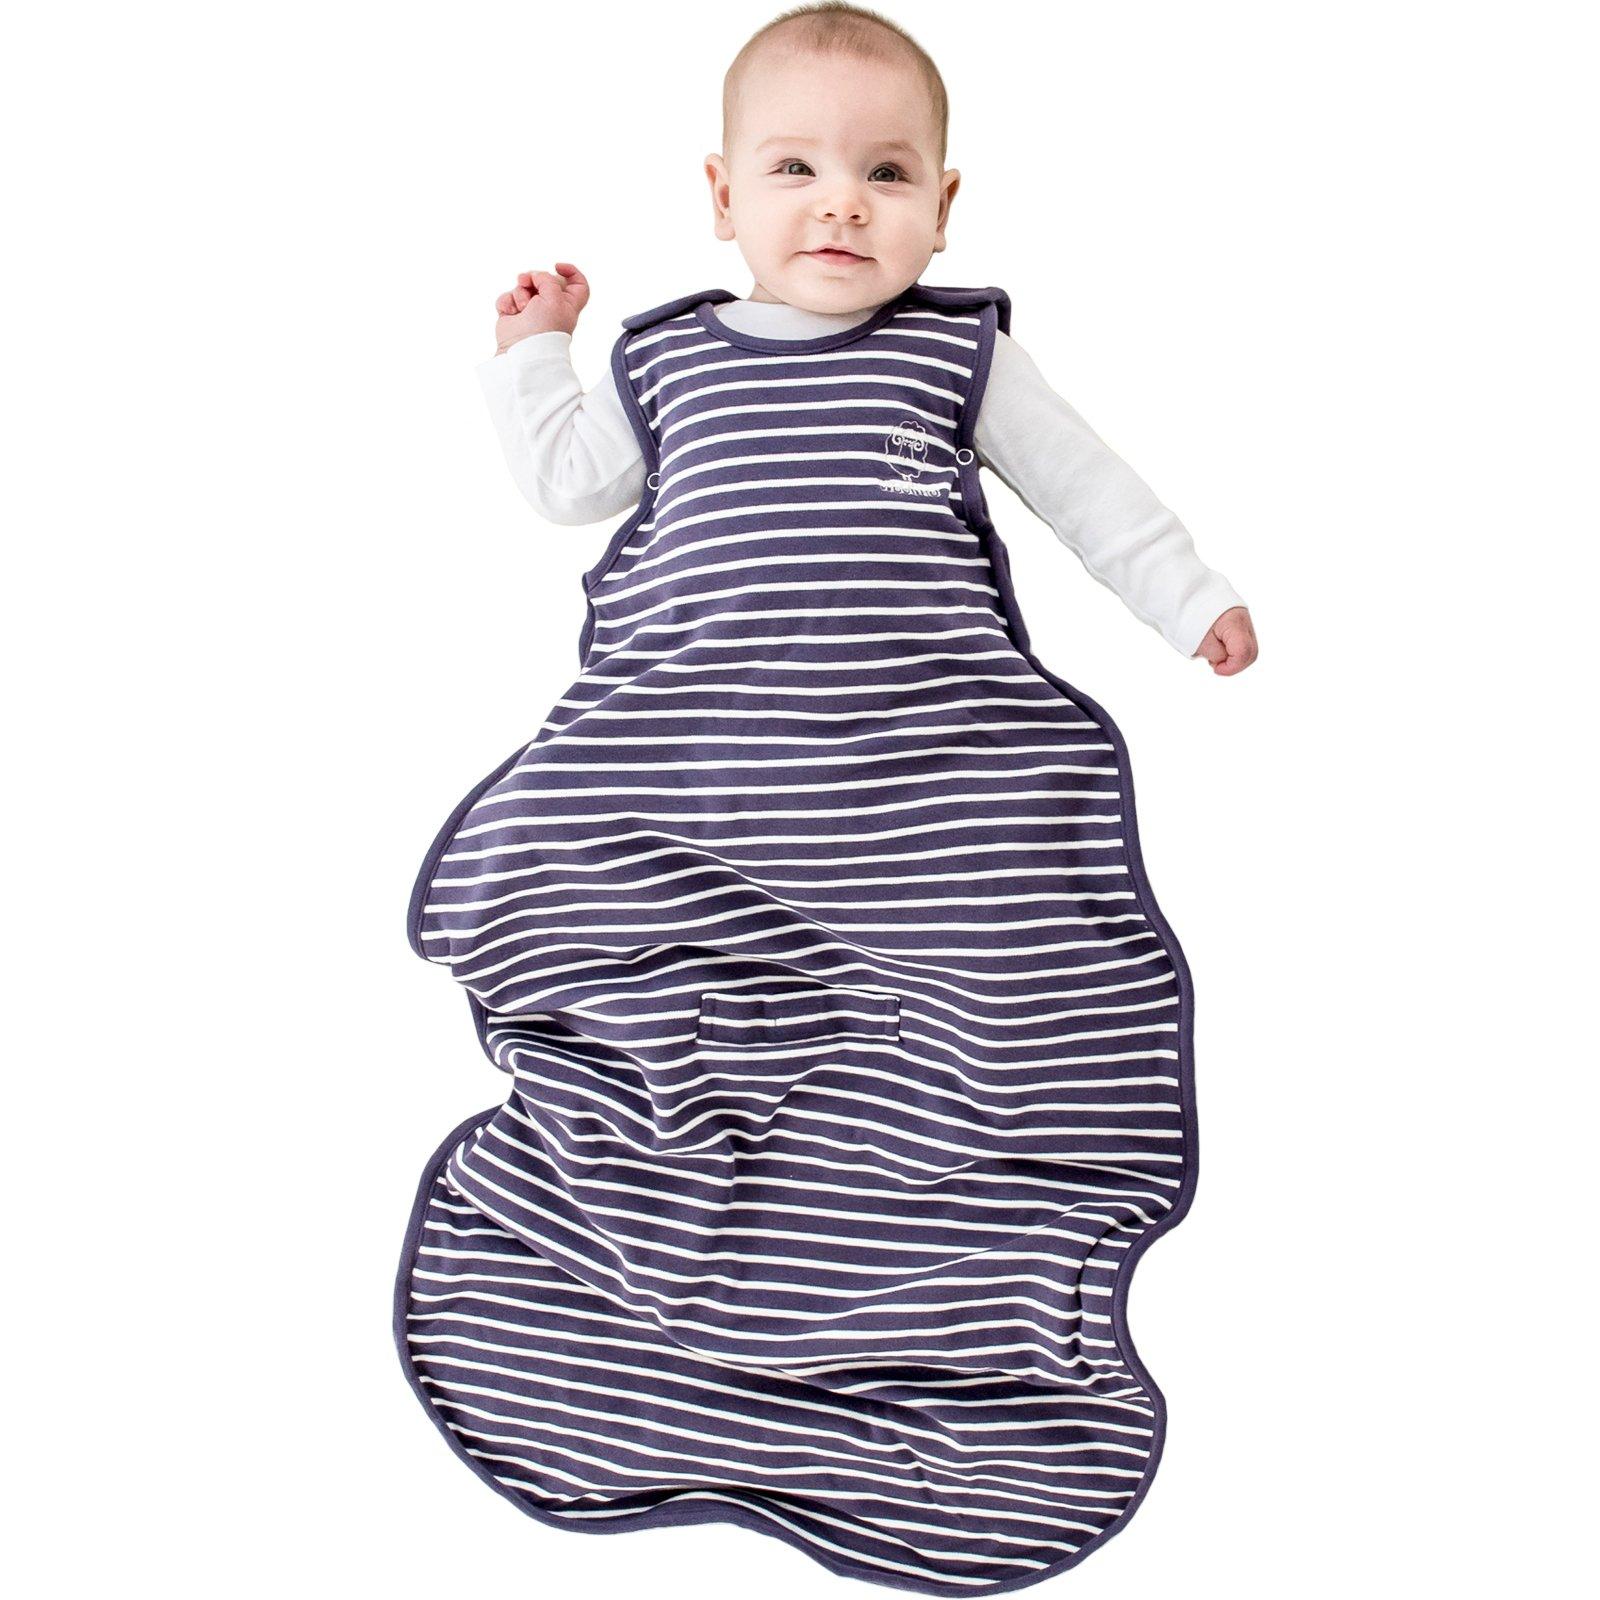 Woolino 4 Season Toddler Sleep Sack, Merino Wool Baby Sleeping Bag, 2-4 Years, Violet